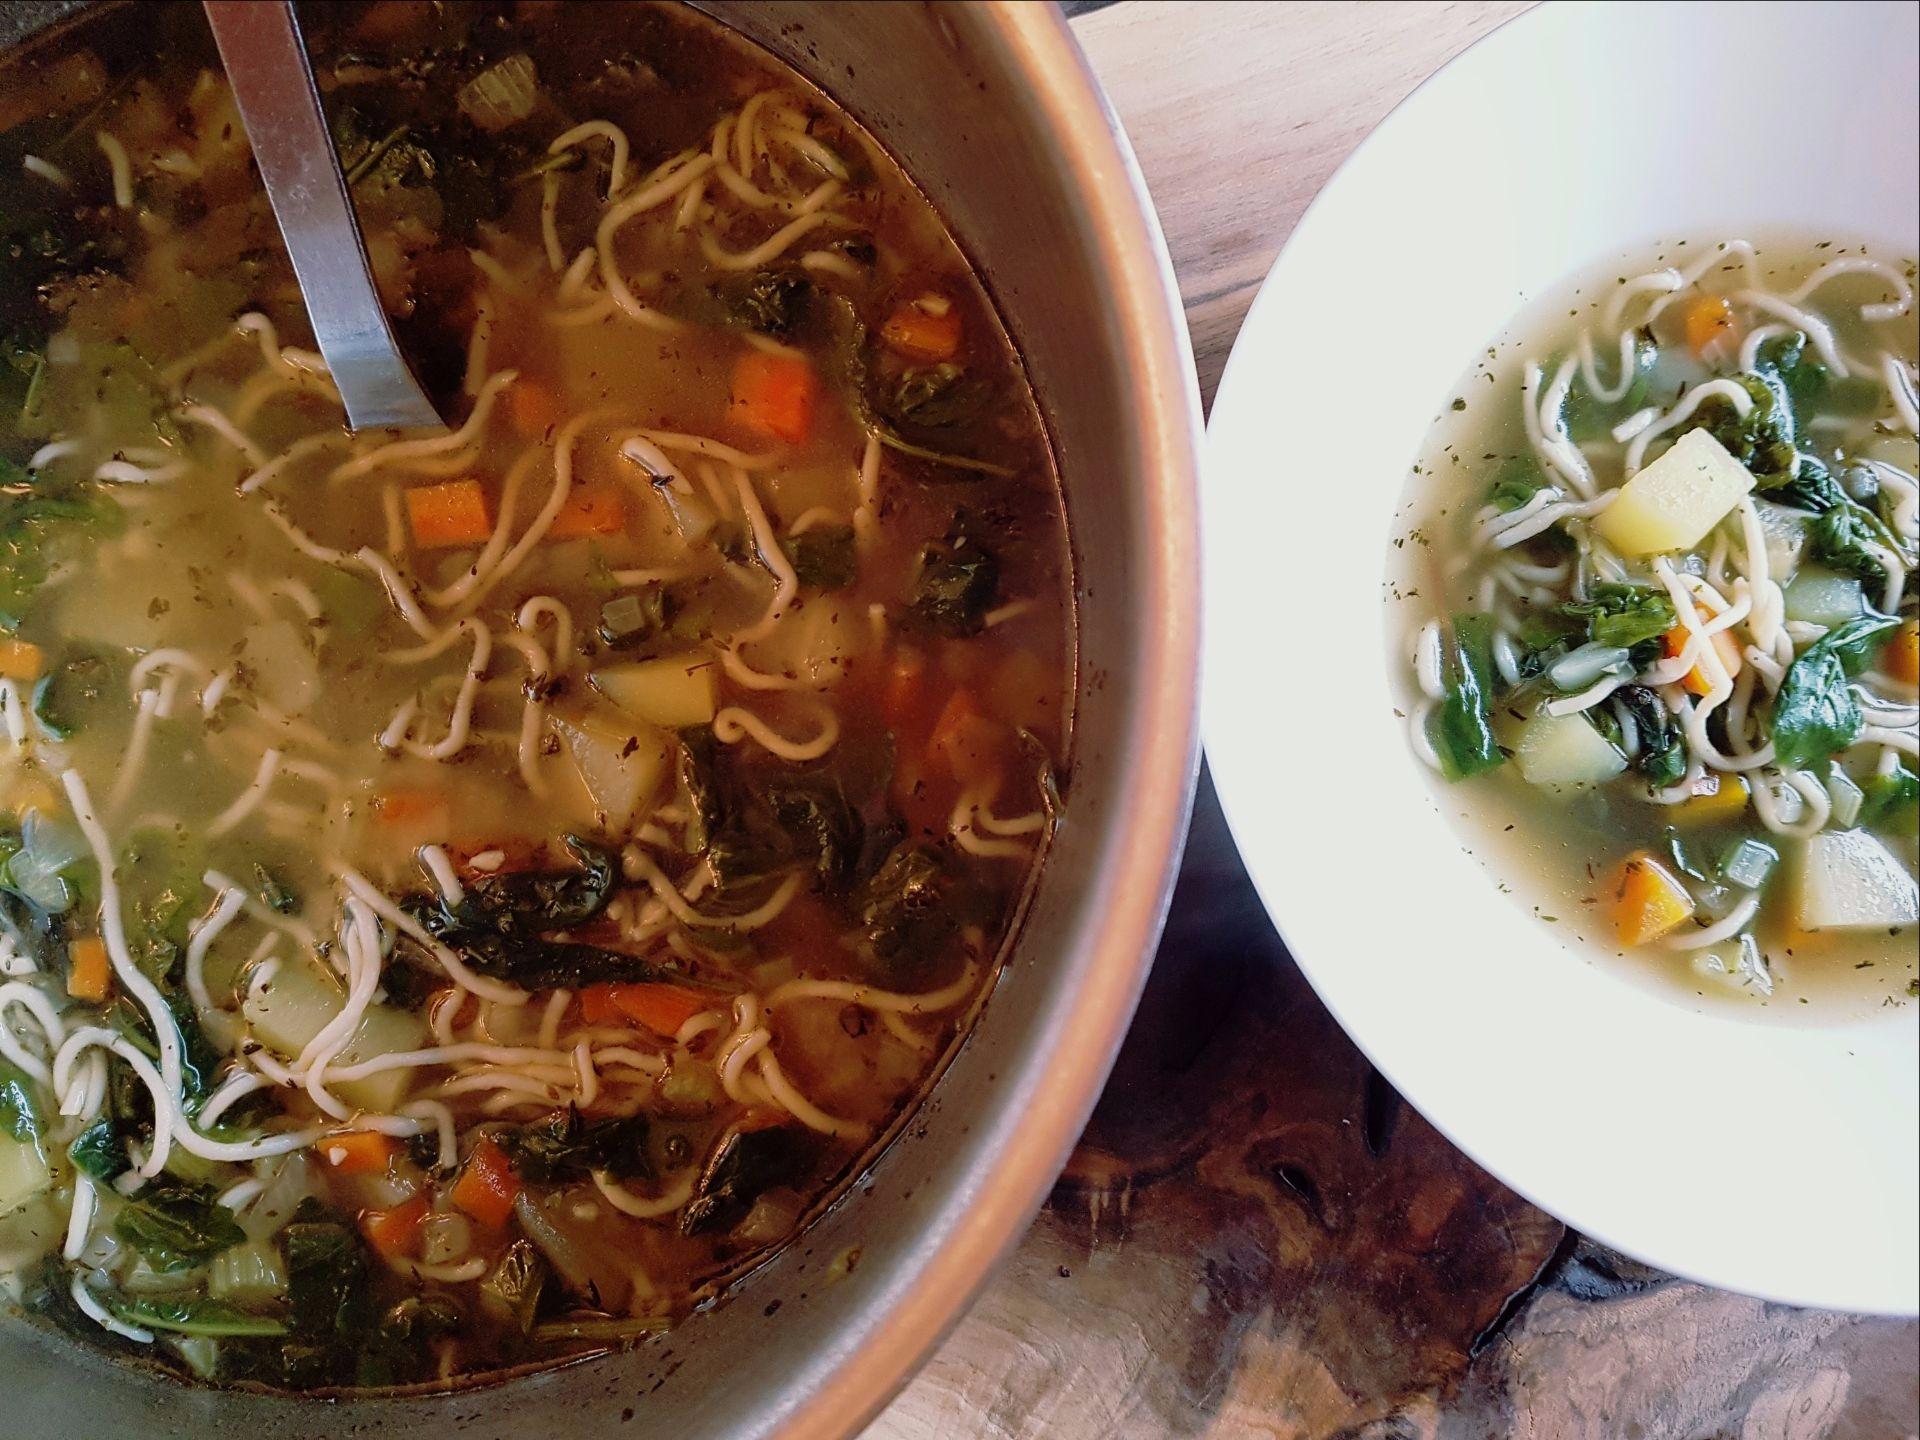 Bowl of Ramen noodles, broth, carrots, kale